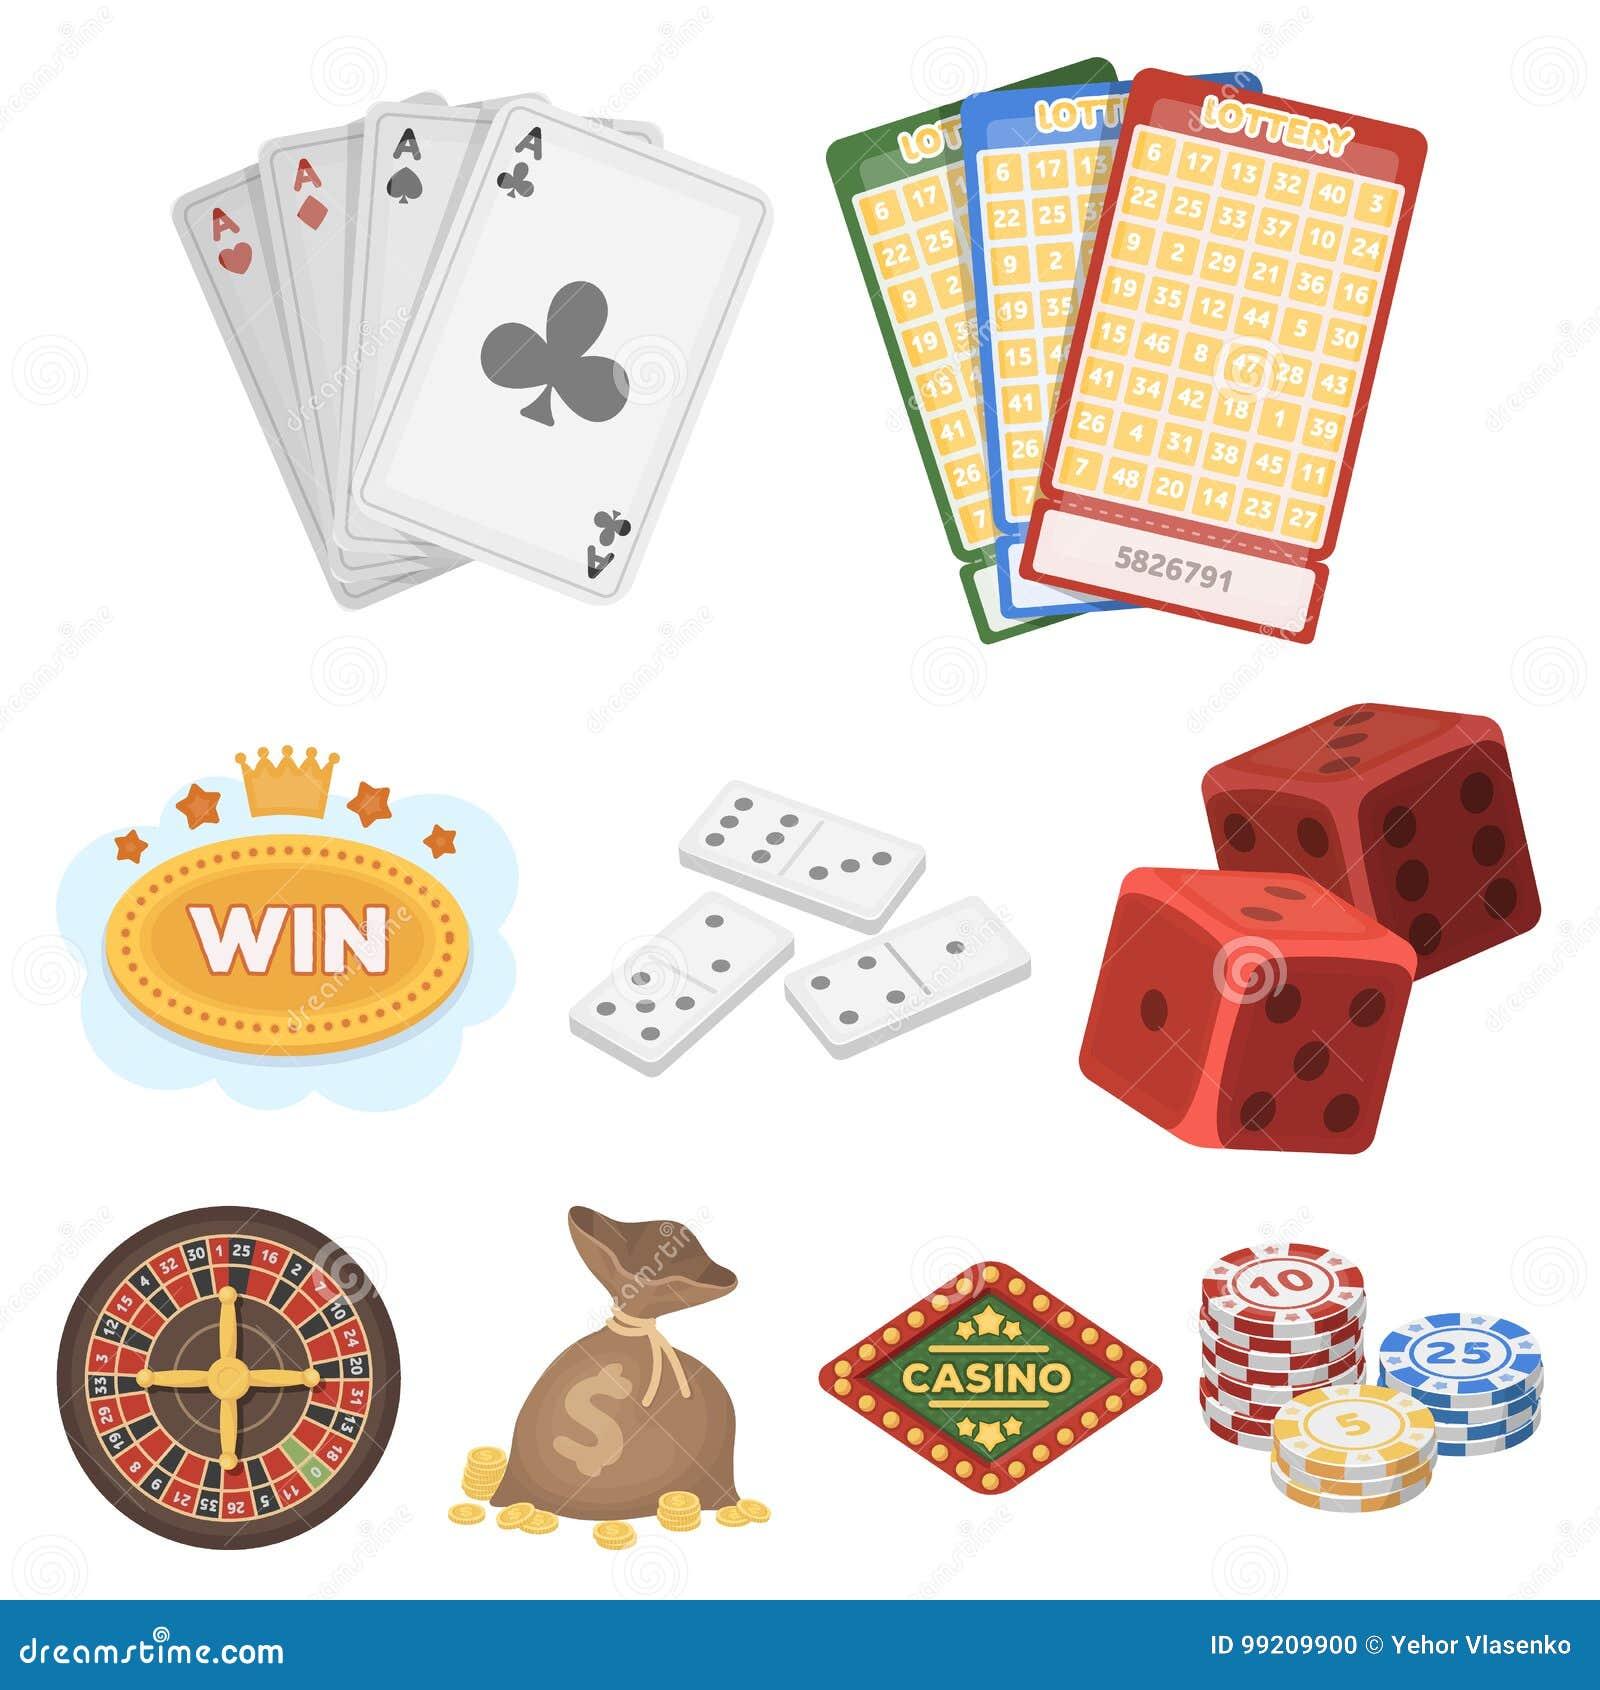 Gambling stock symbols online casino scams uk